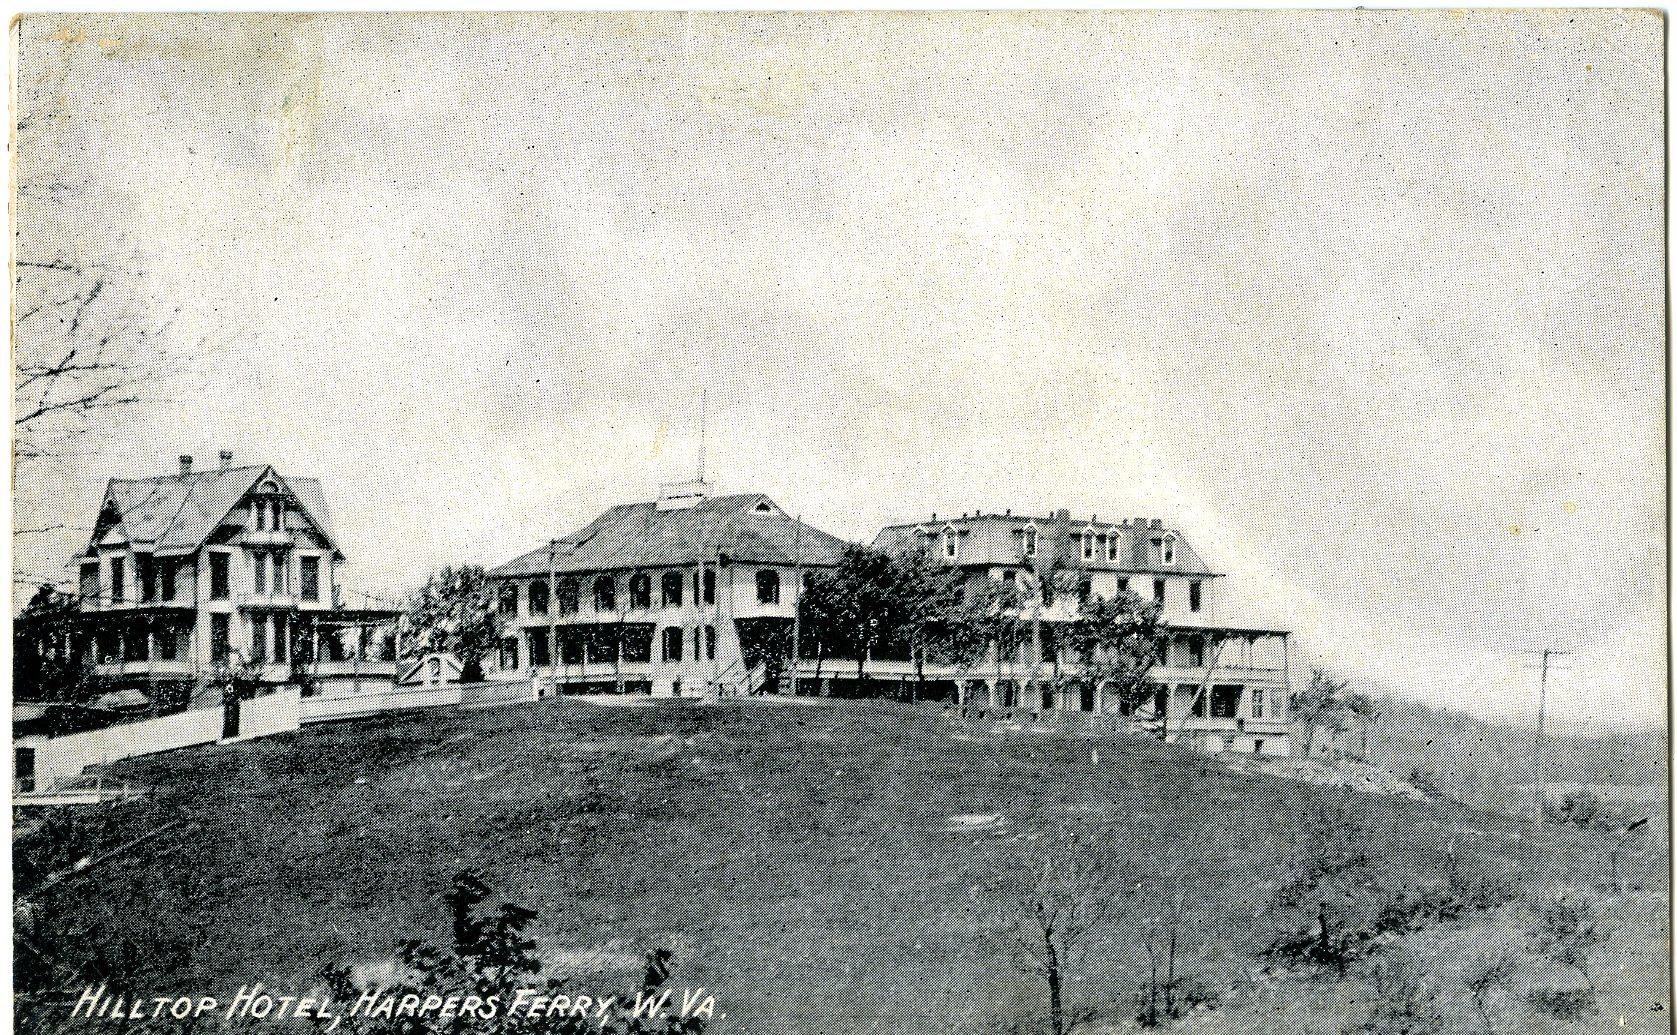 Hilltop House Hotel, 1909